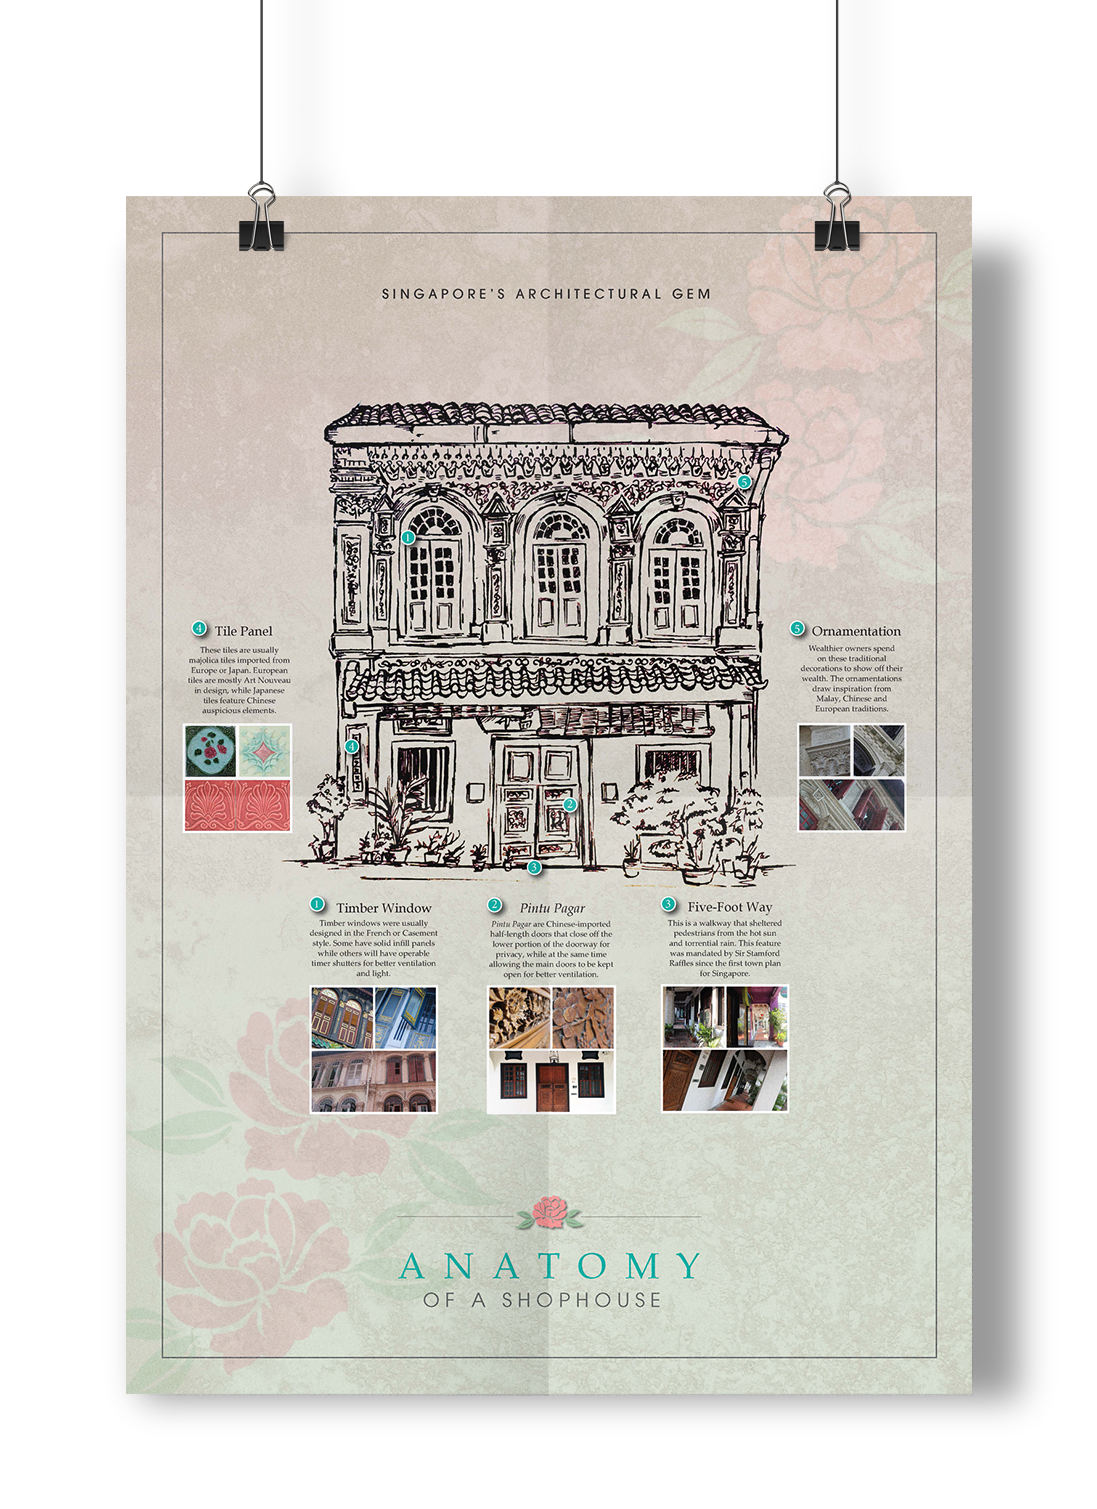 Anatomy of a Shophouse - WRONG v2